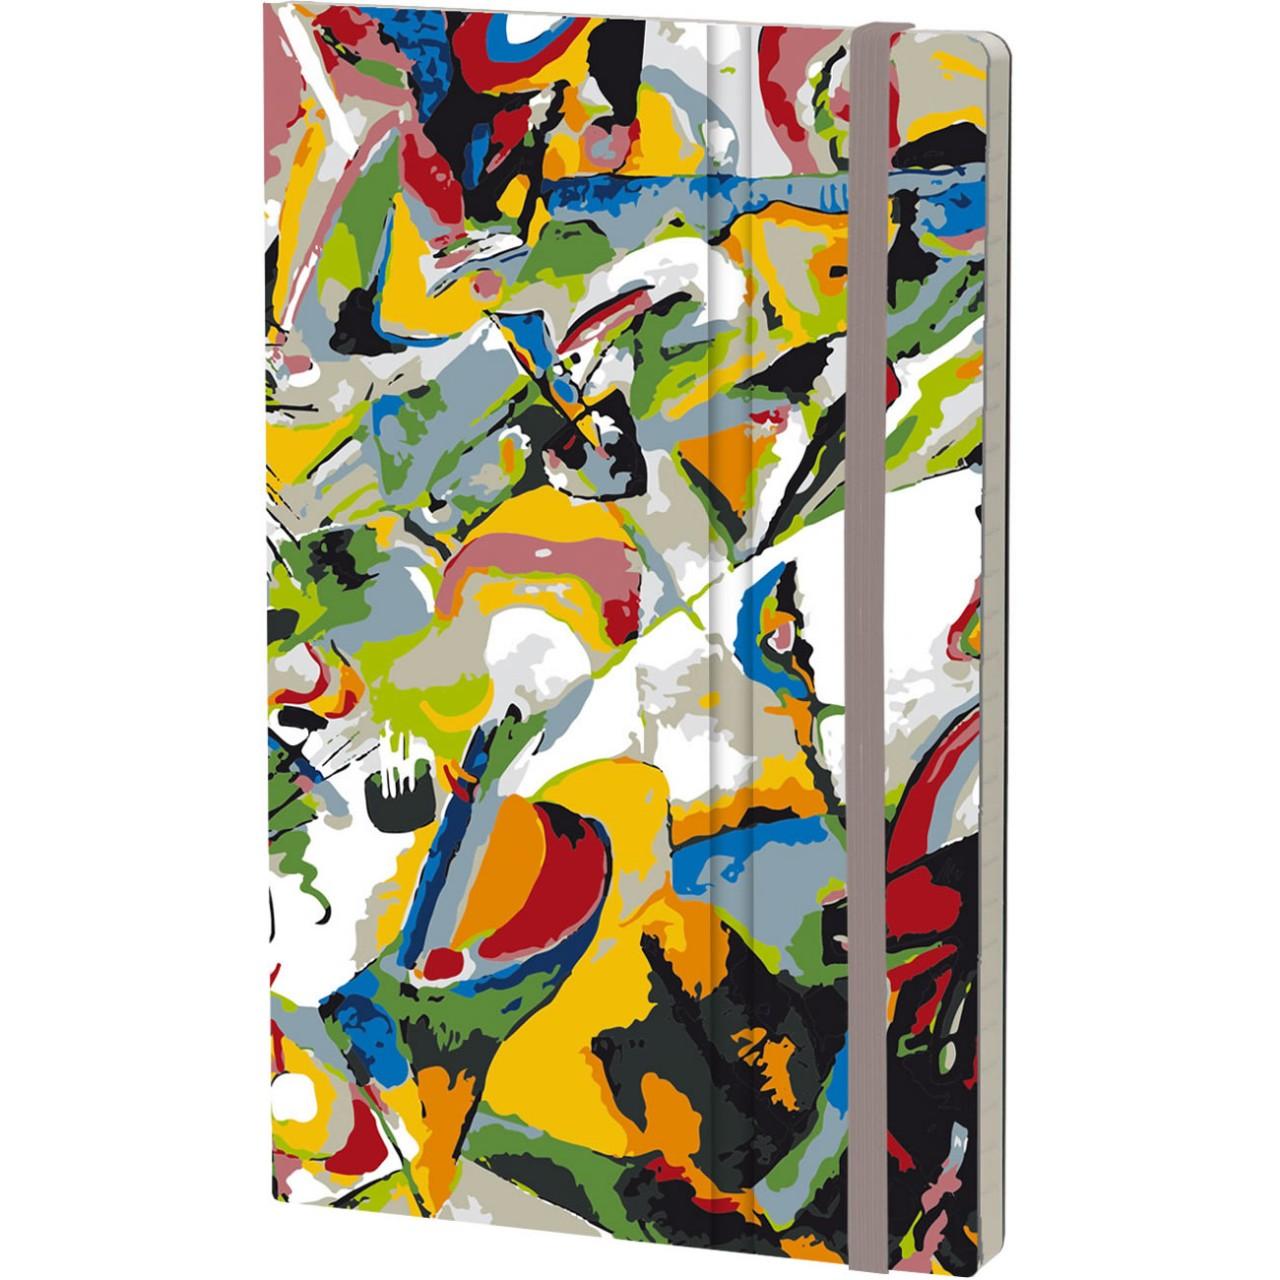 Stifflex Notizbuch ART 9 x 14 cm 144 S., KANDINSKY